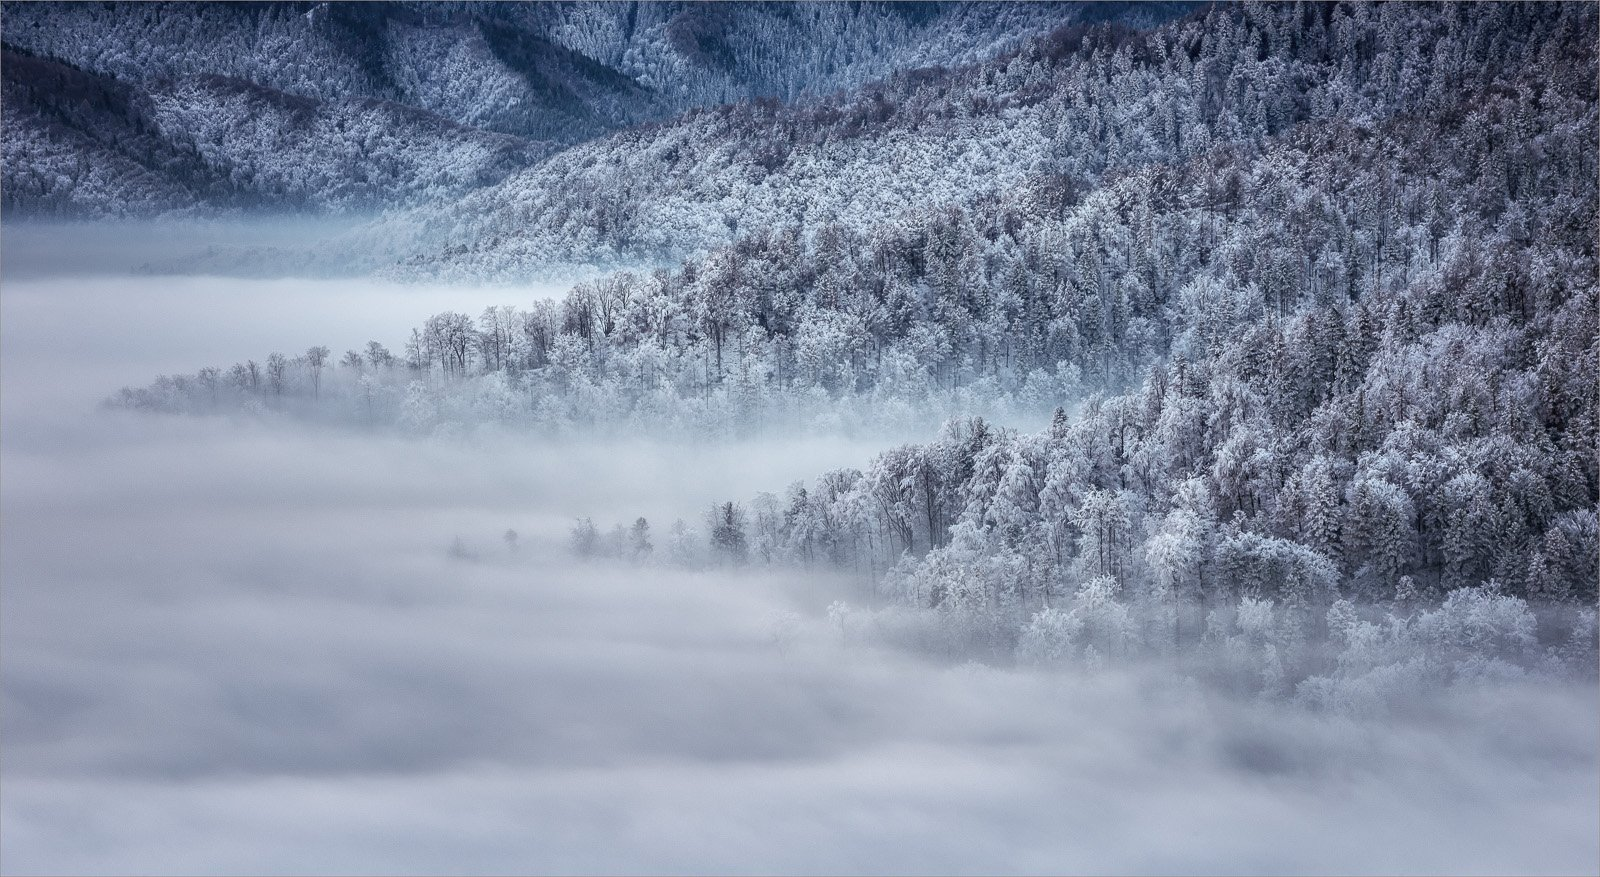 Fog, Landscape, Mountain, Ioan Chiriac